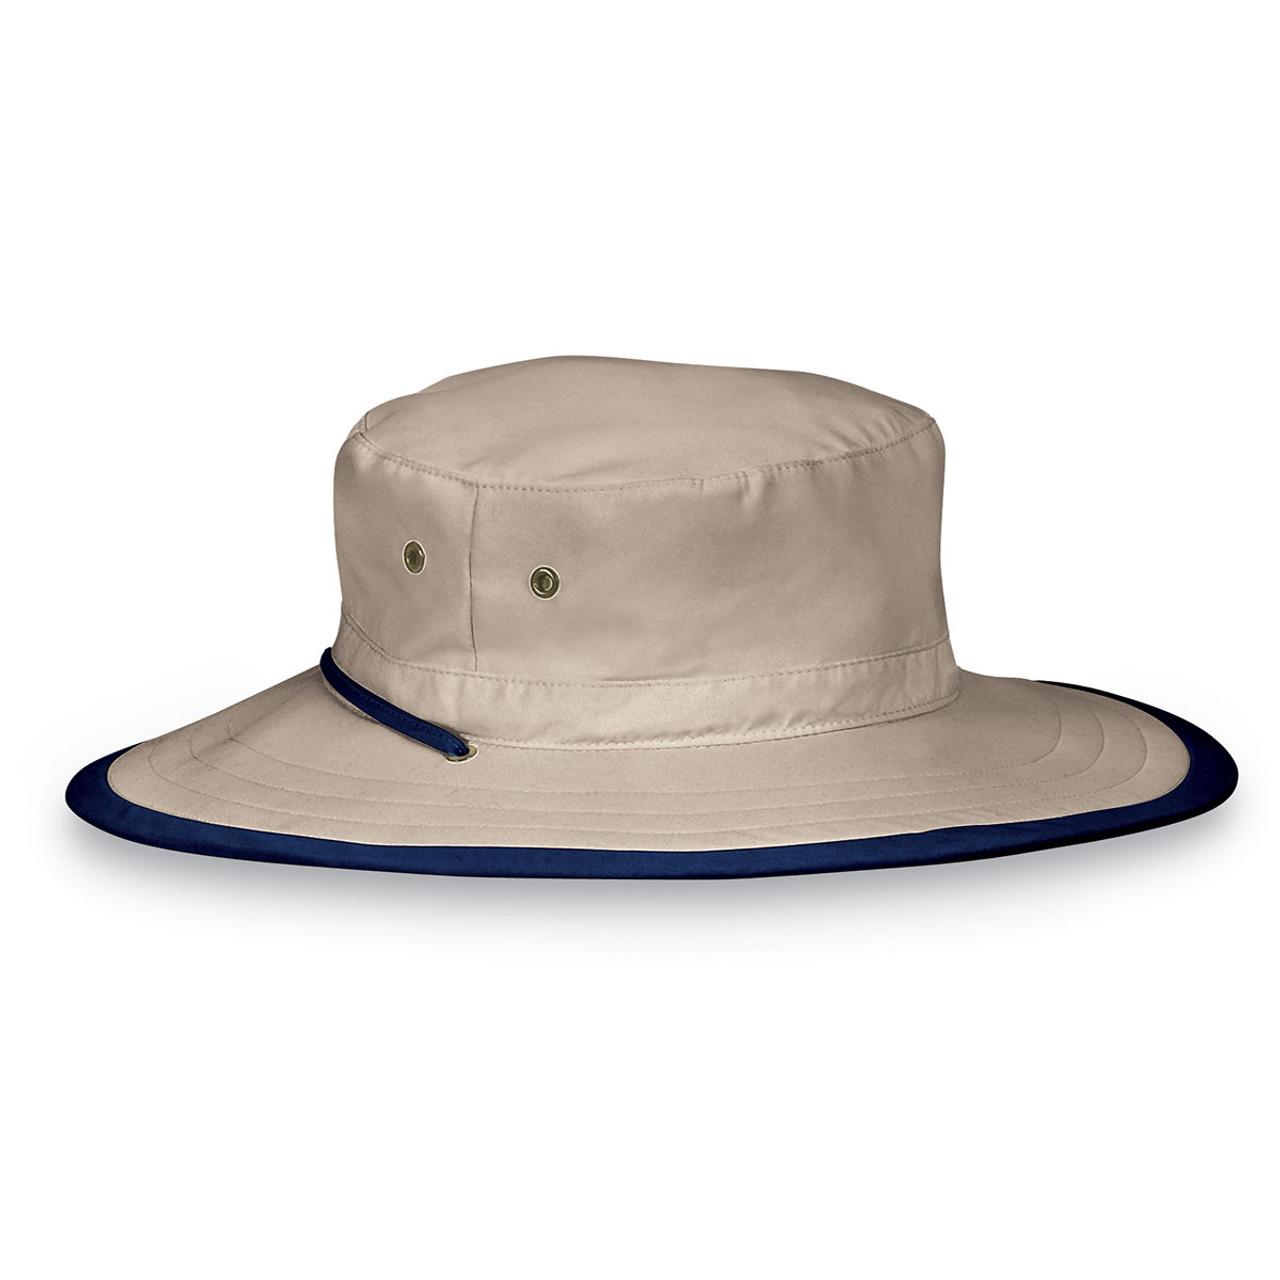 Mens Wallaroo UPF50+ explorer sun hats camel navy d79486dc403a